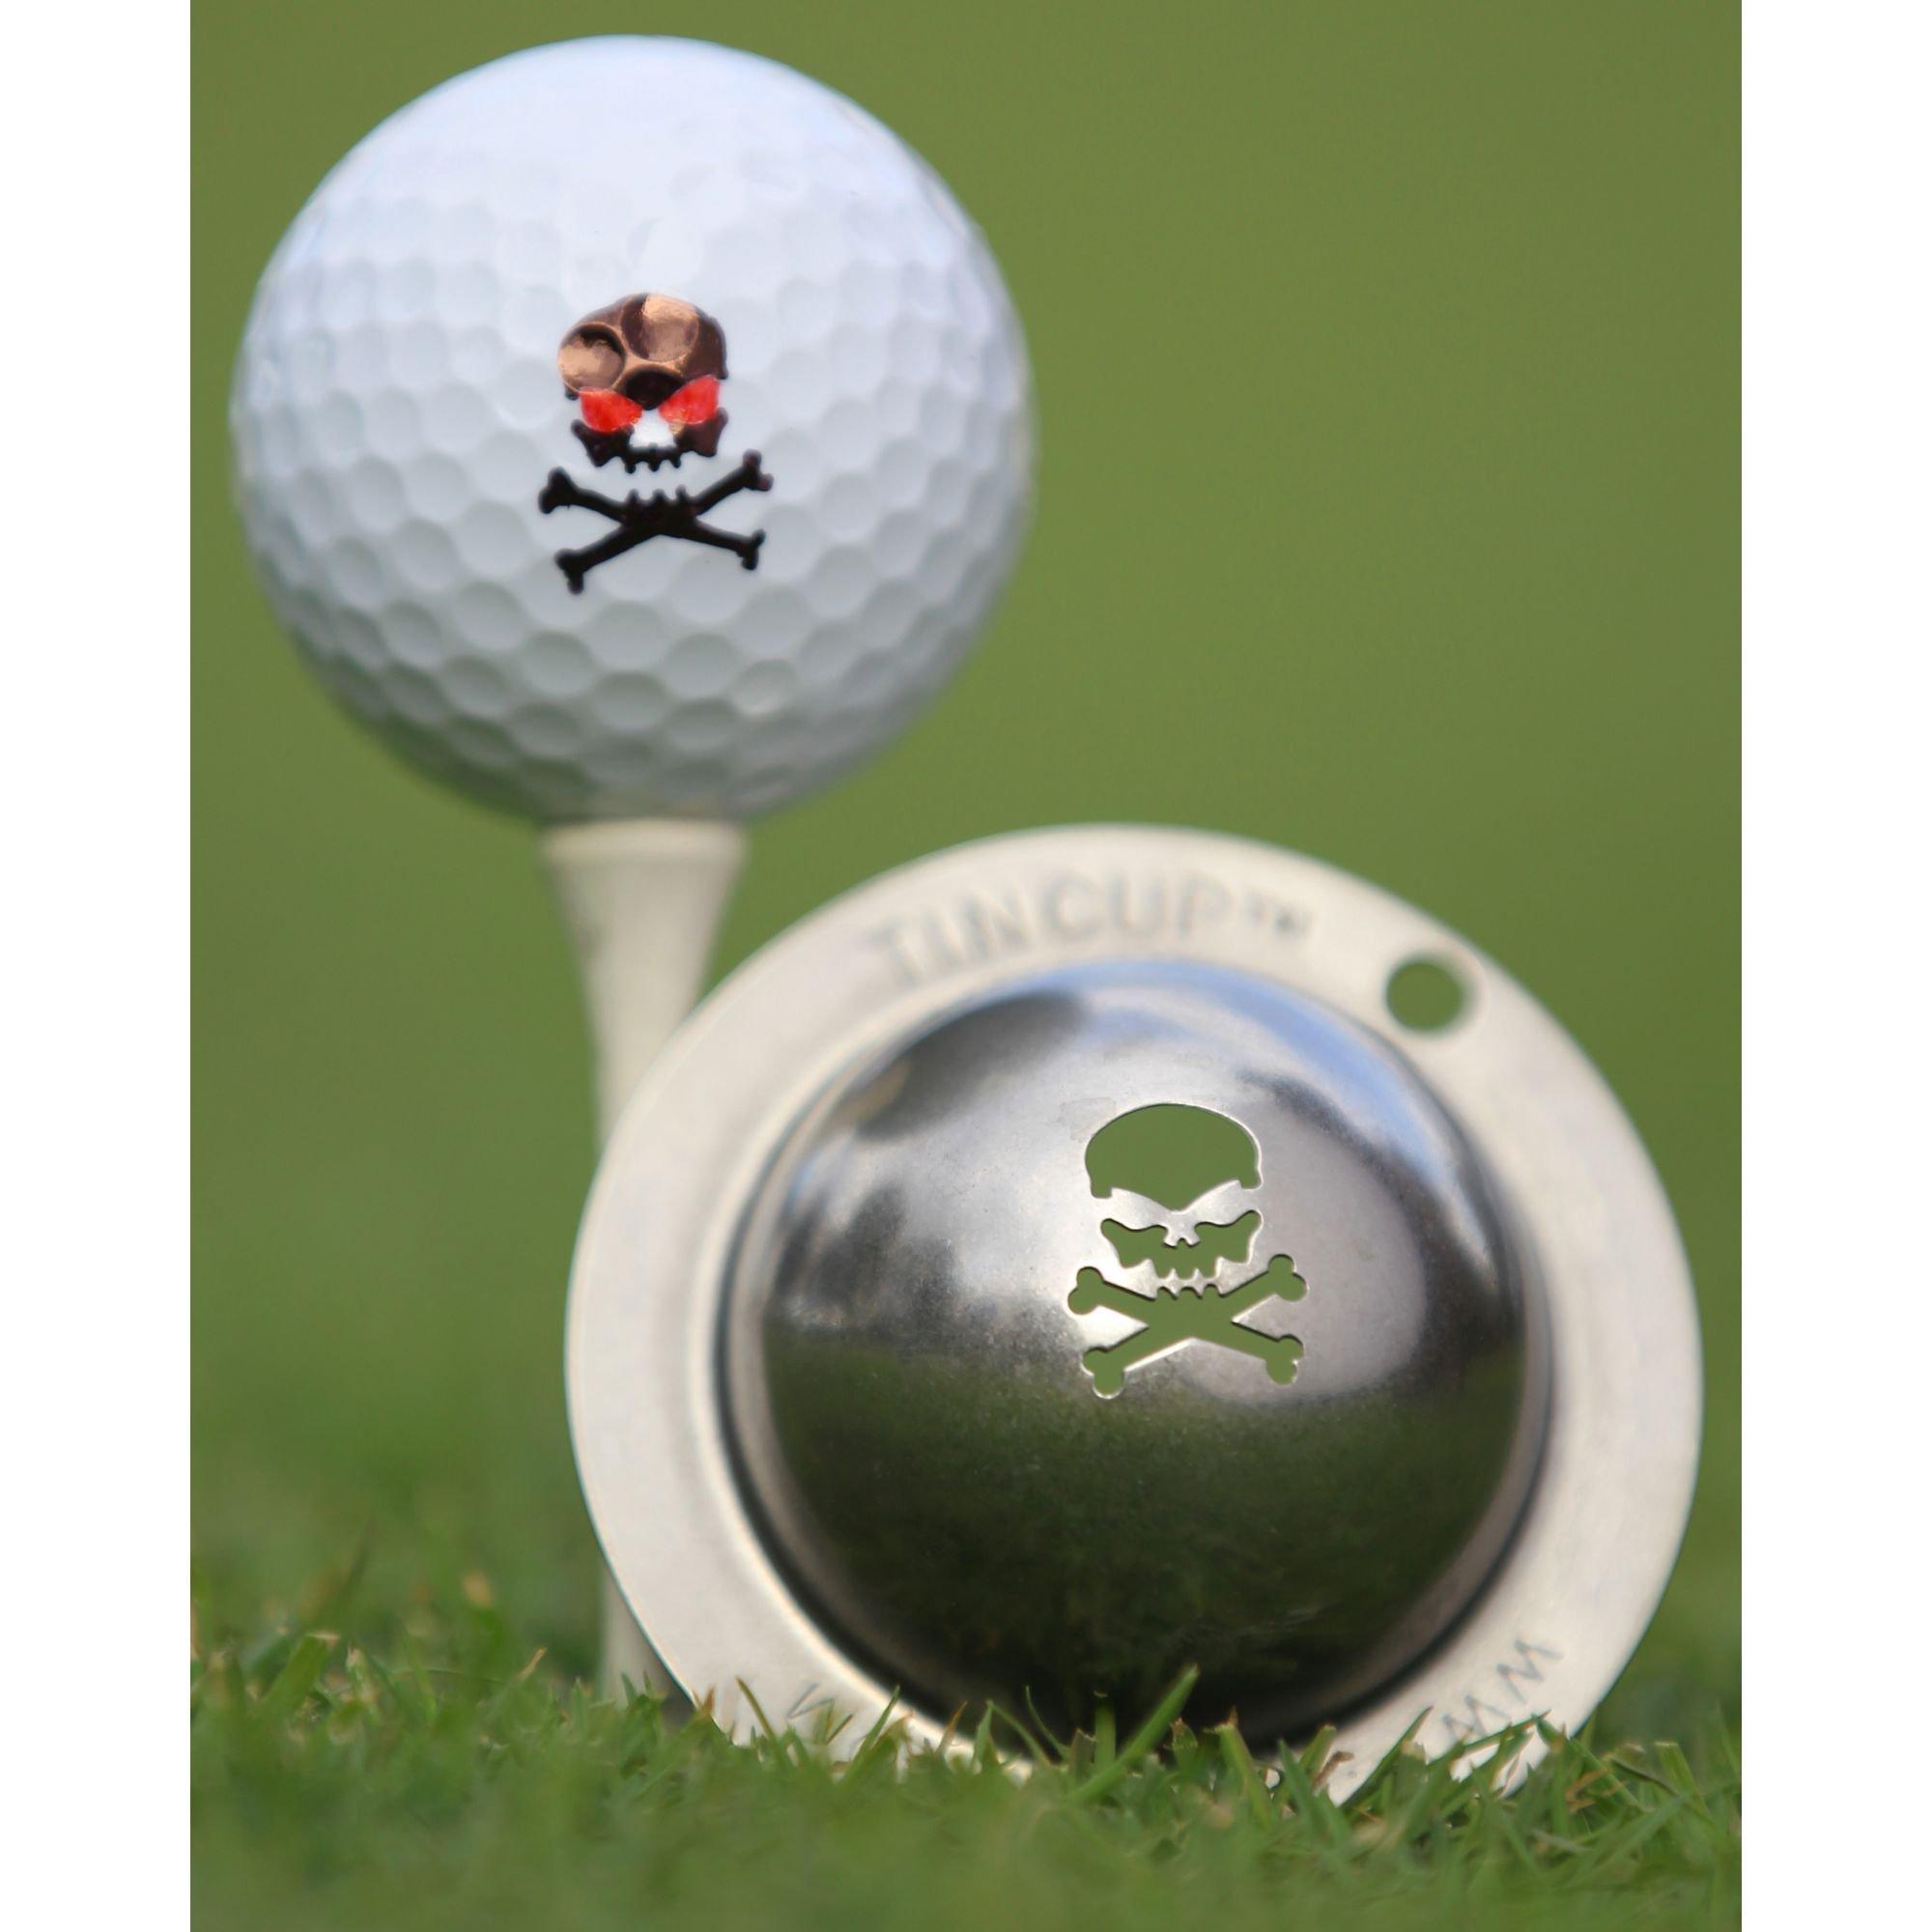 Golf Ball Marking Stencil Amazon